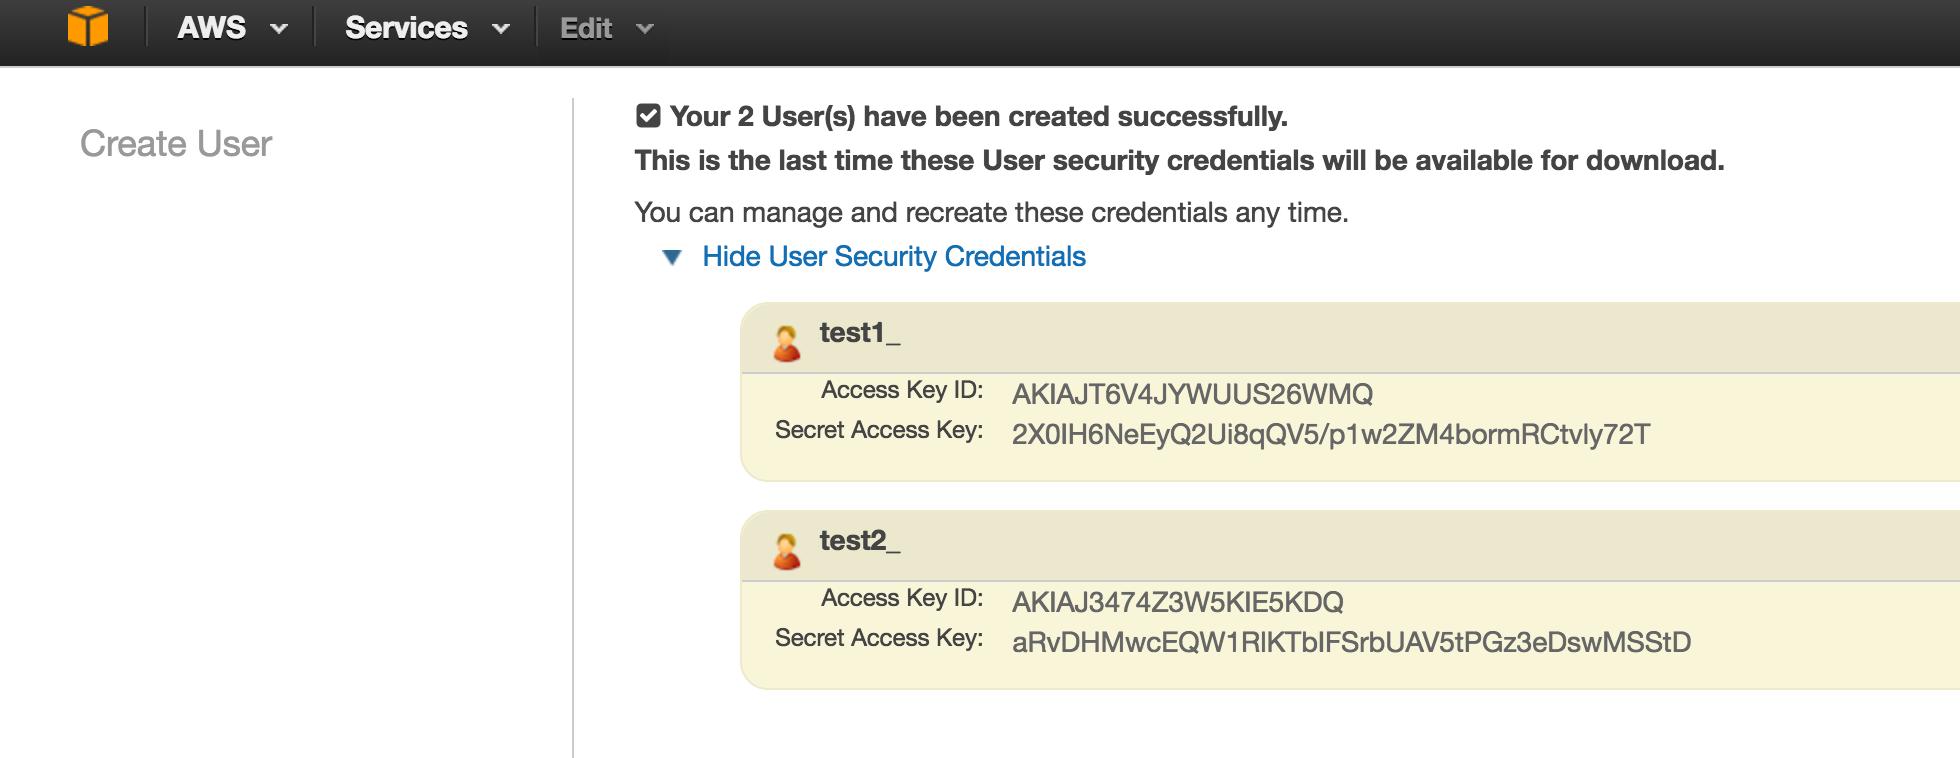 Configuring Amazon Web Services (AWS) for using Lambda